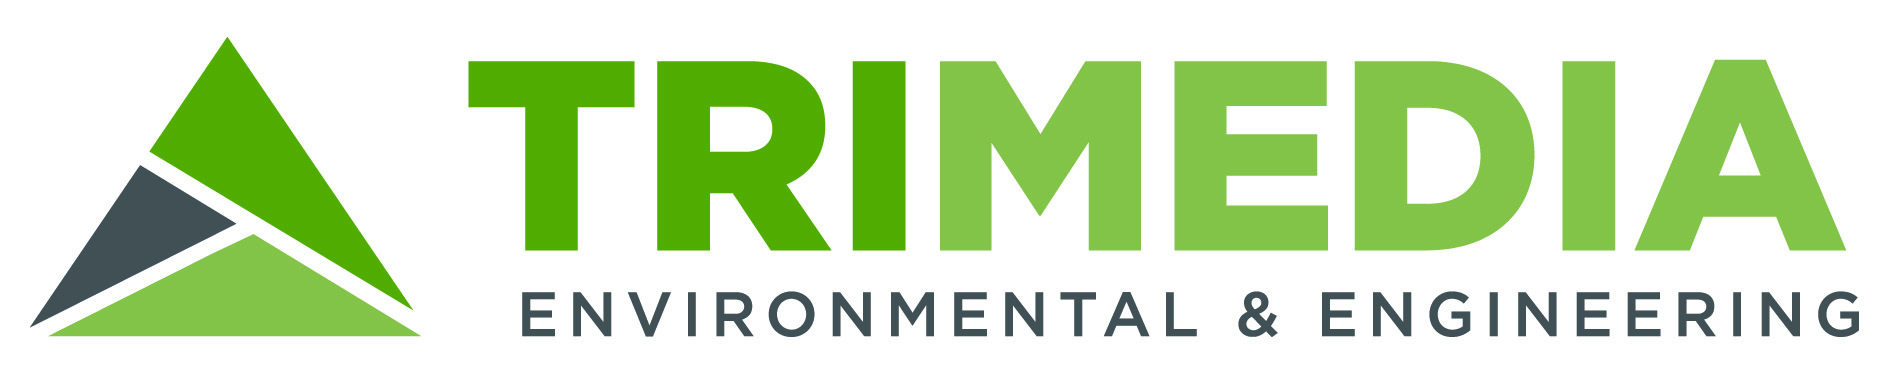 TriMedia Environmental and Engineering